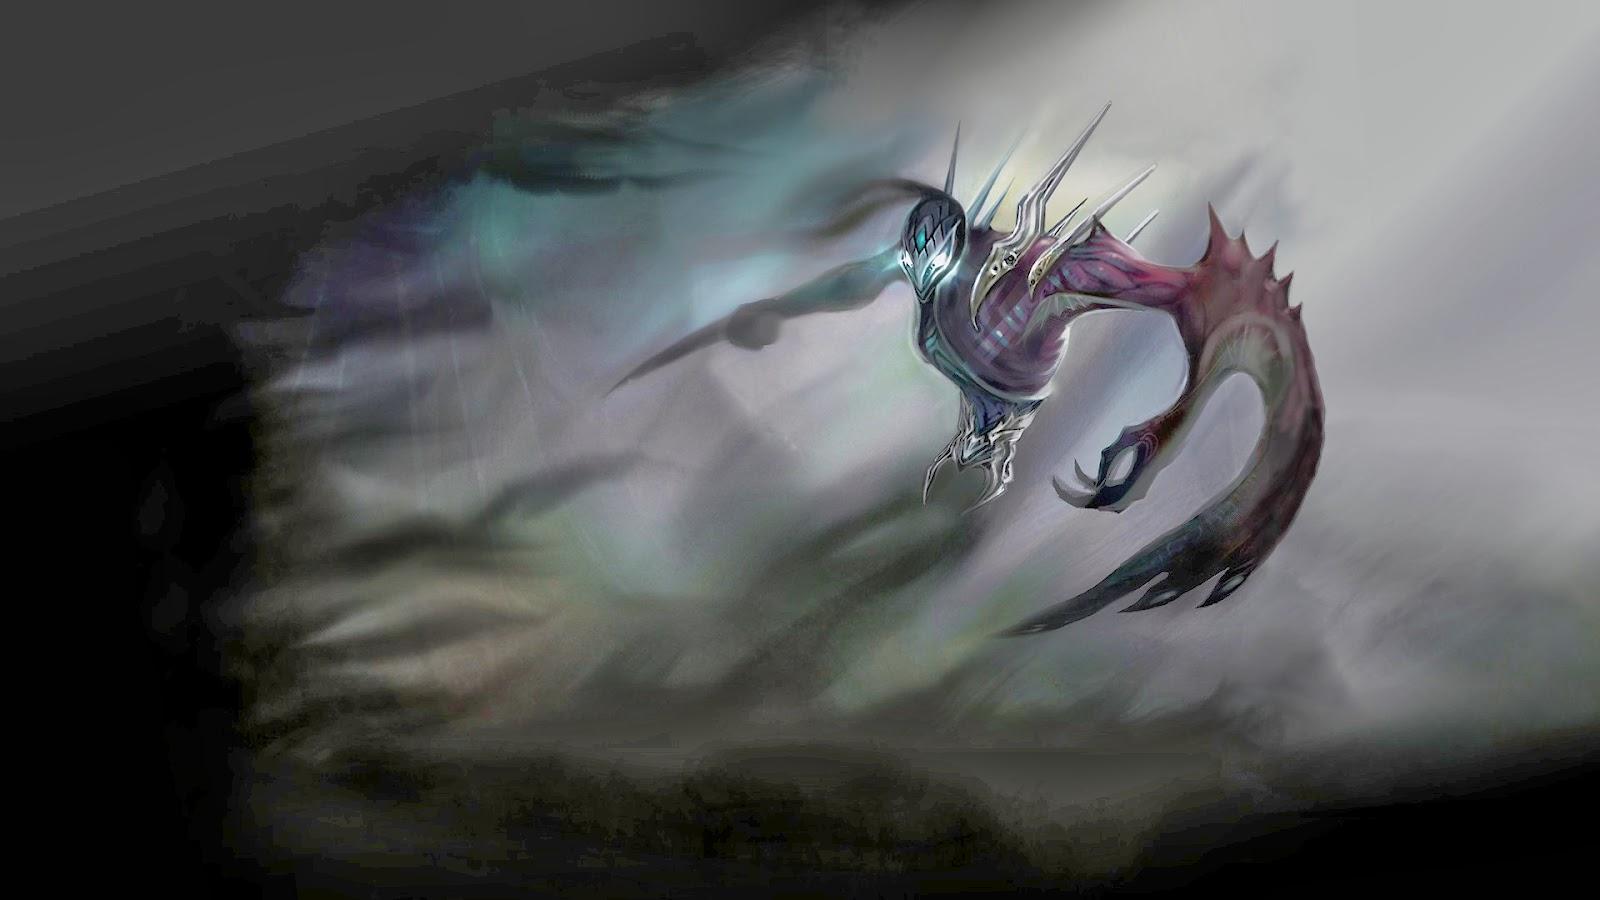 League of Legends Nocturne Wallpaper - WallpaperSafari